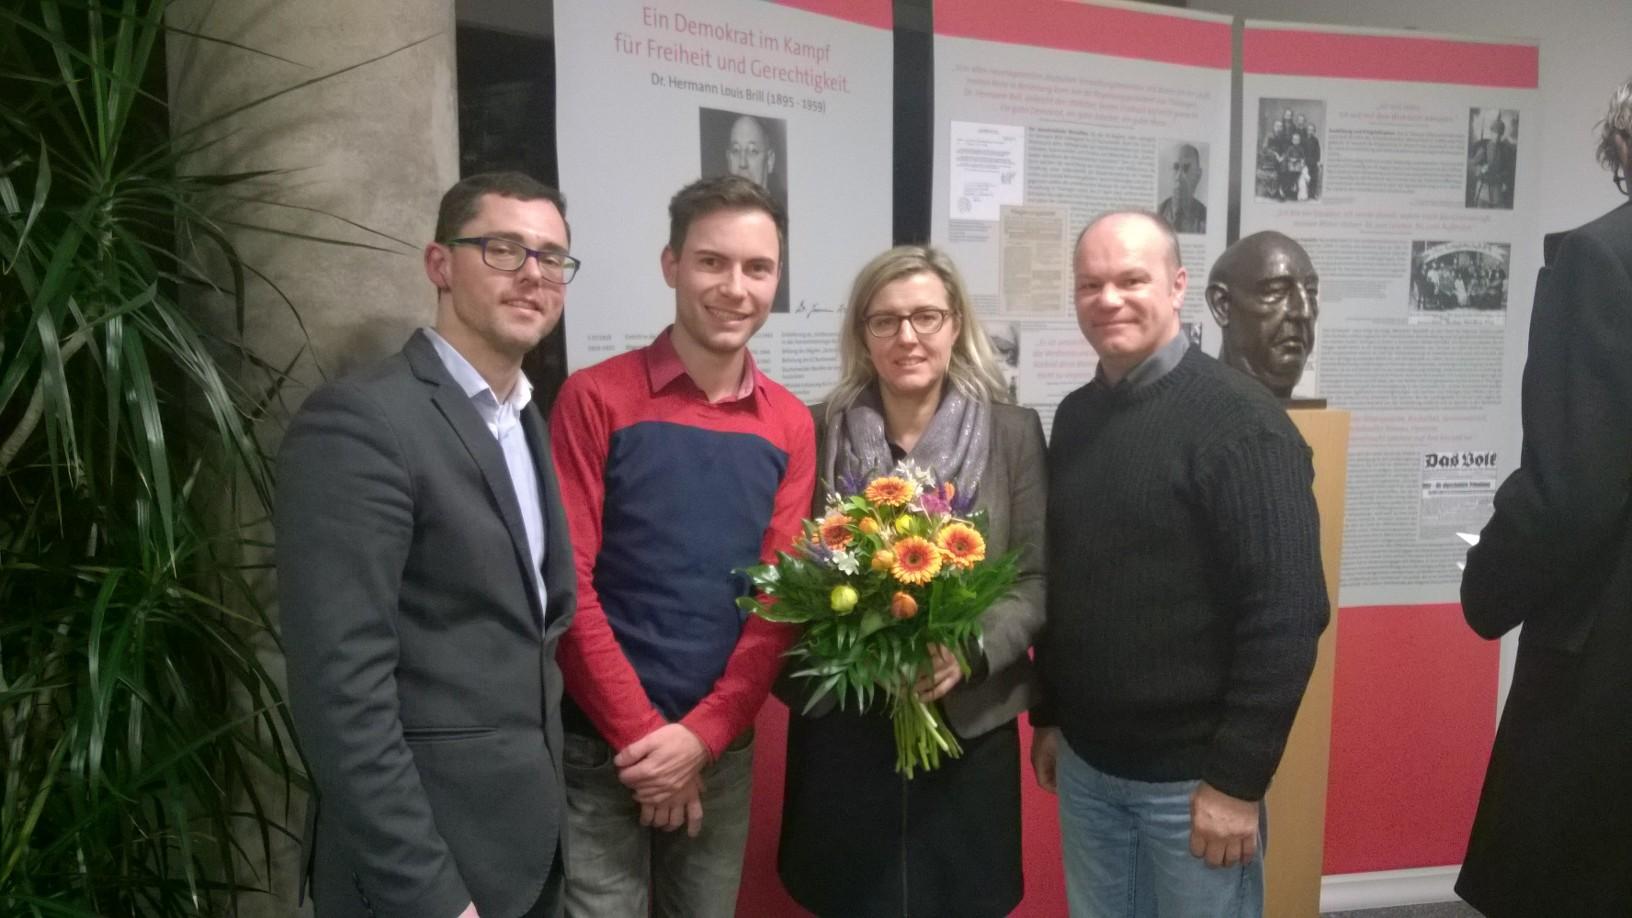 v.l.: Michael Klostermann, Maik Klotzbach, Marion Rosin, Mario Demme